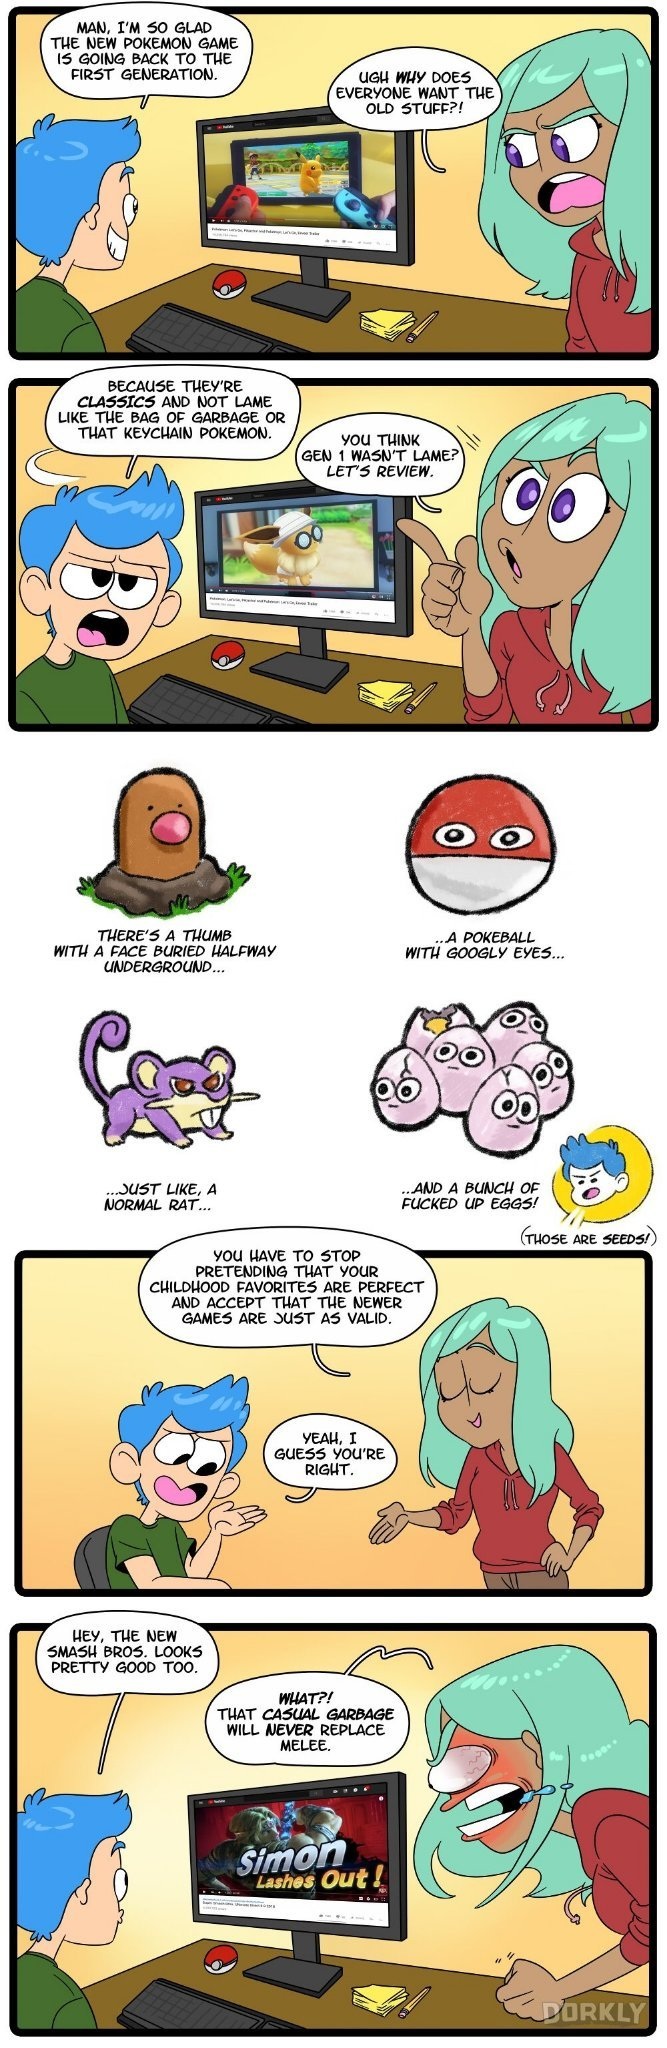 The best Pokémon game is Soul Silver/Heart Gold - meme